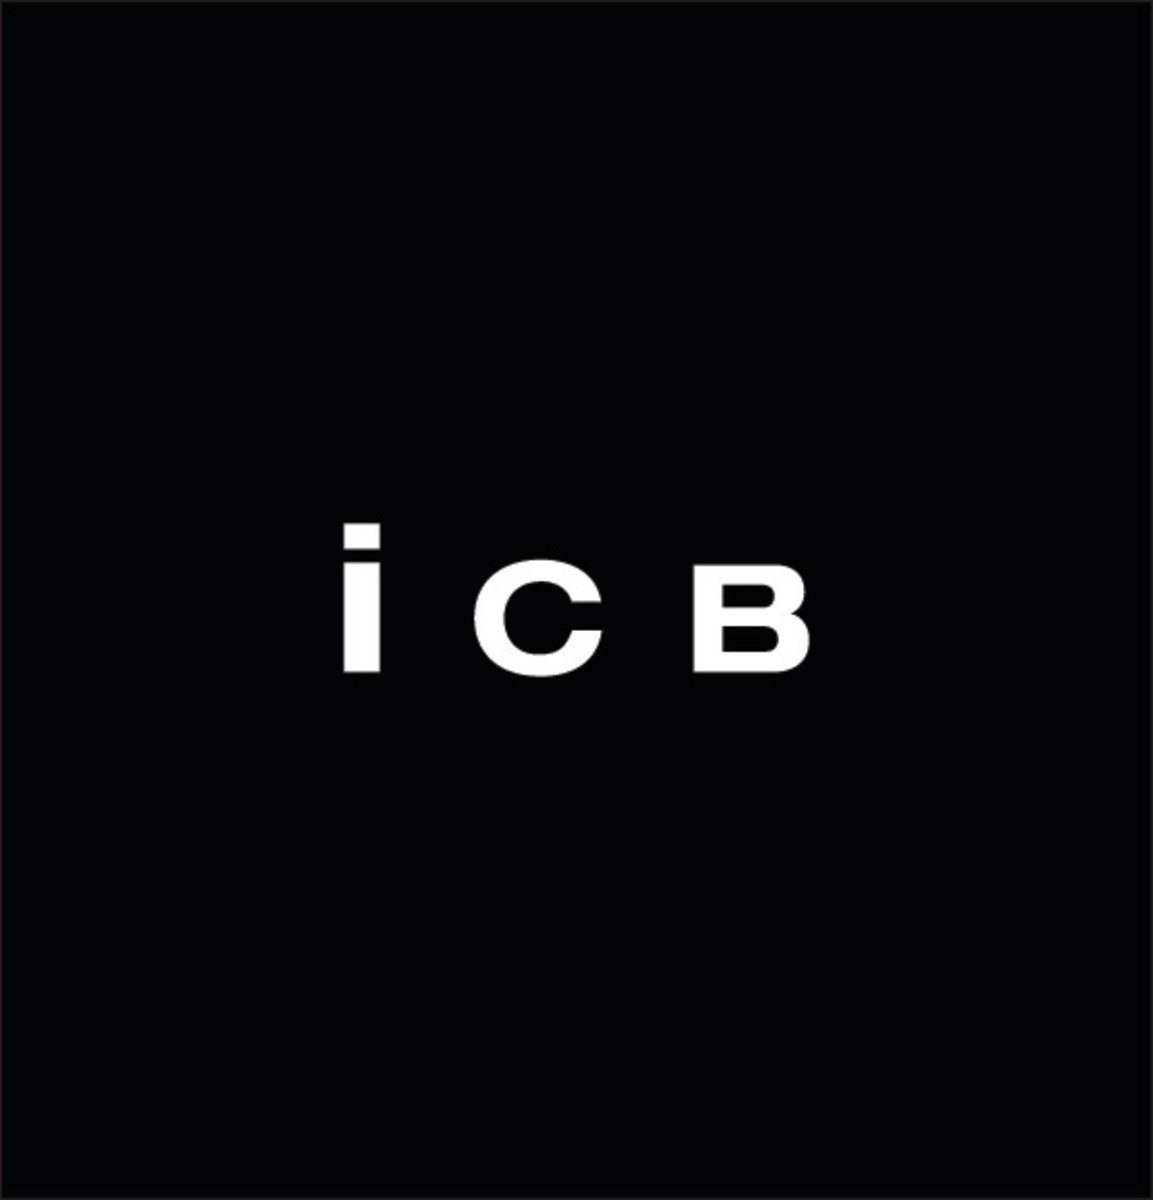 icb_logo_W&B.jpg